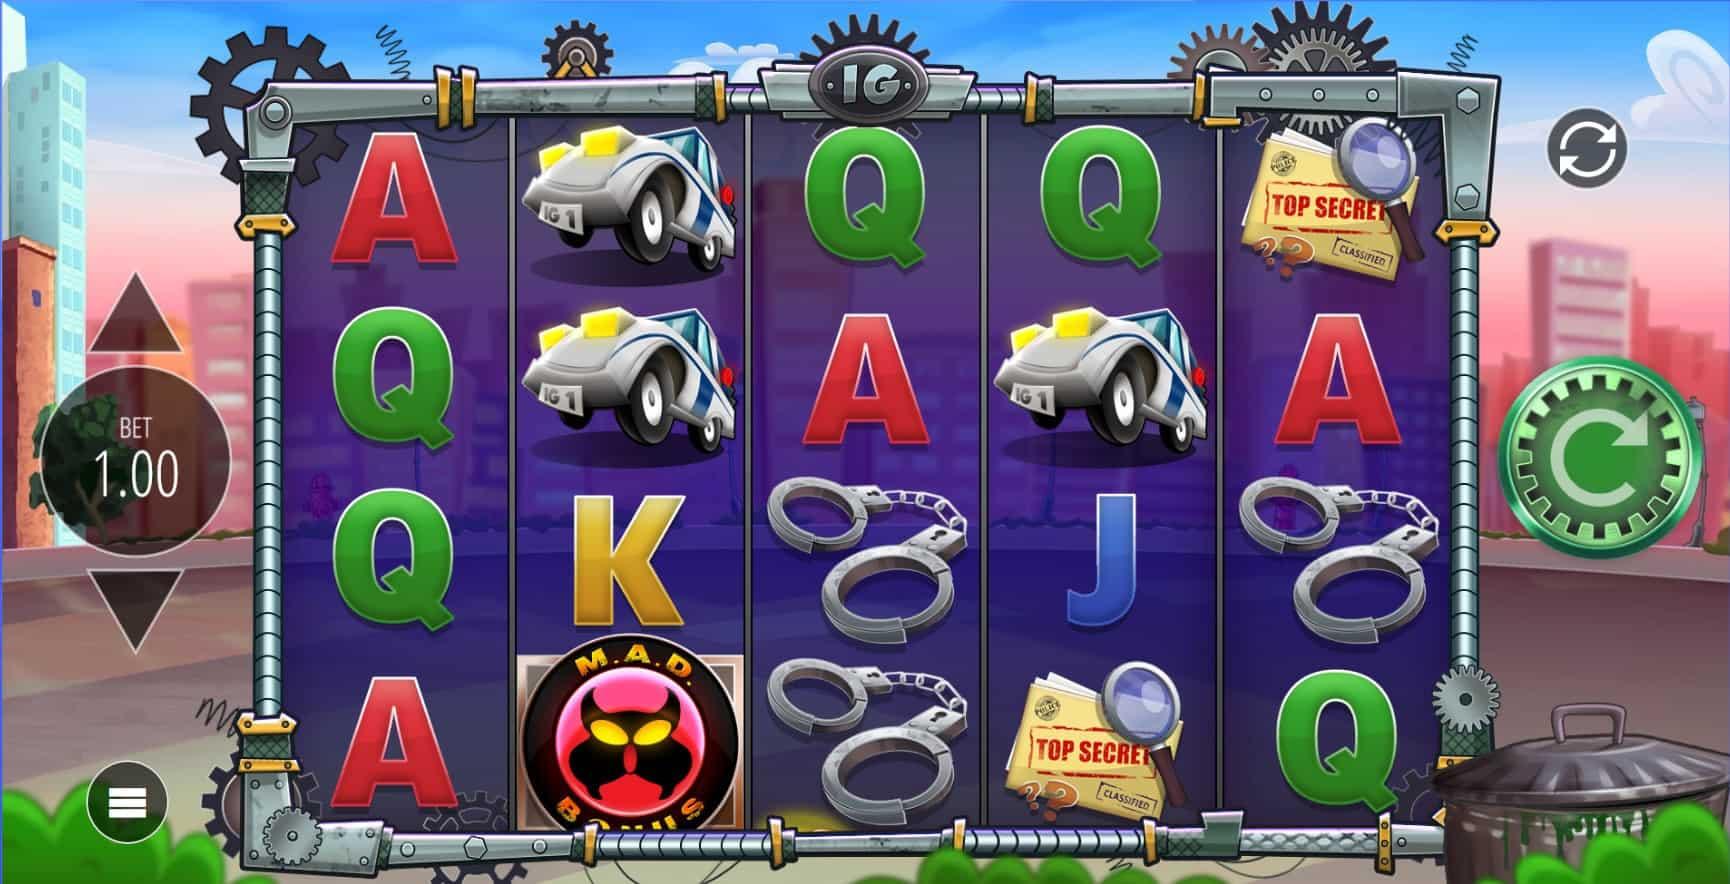 Blueprint - inspector gadget - reels- casinogroundsdotcom (3)